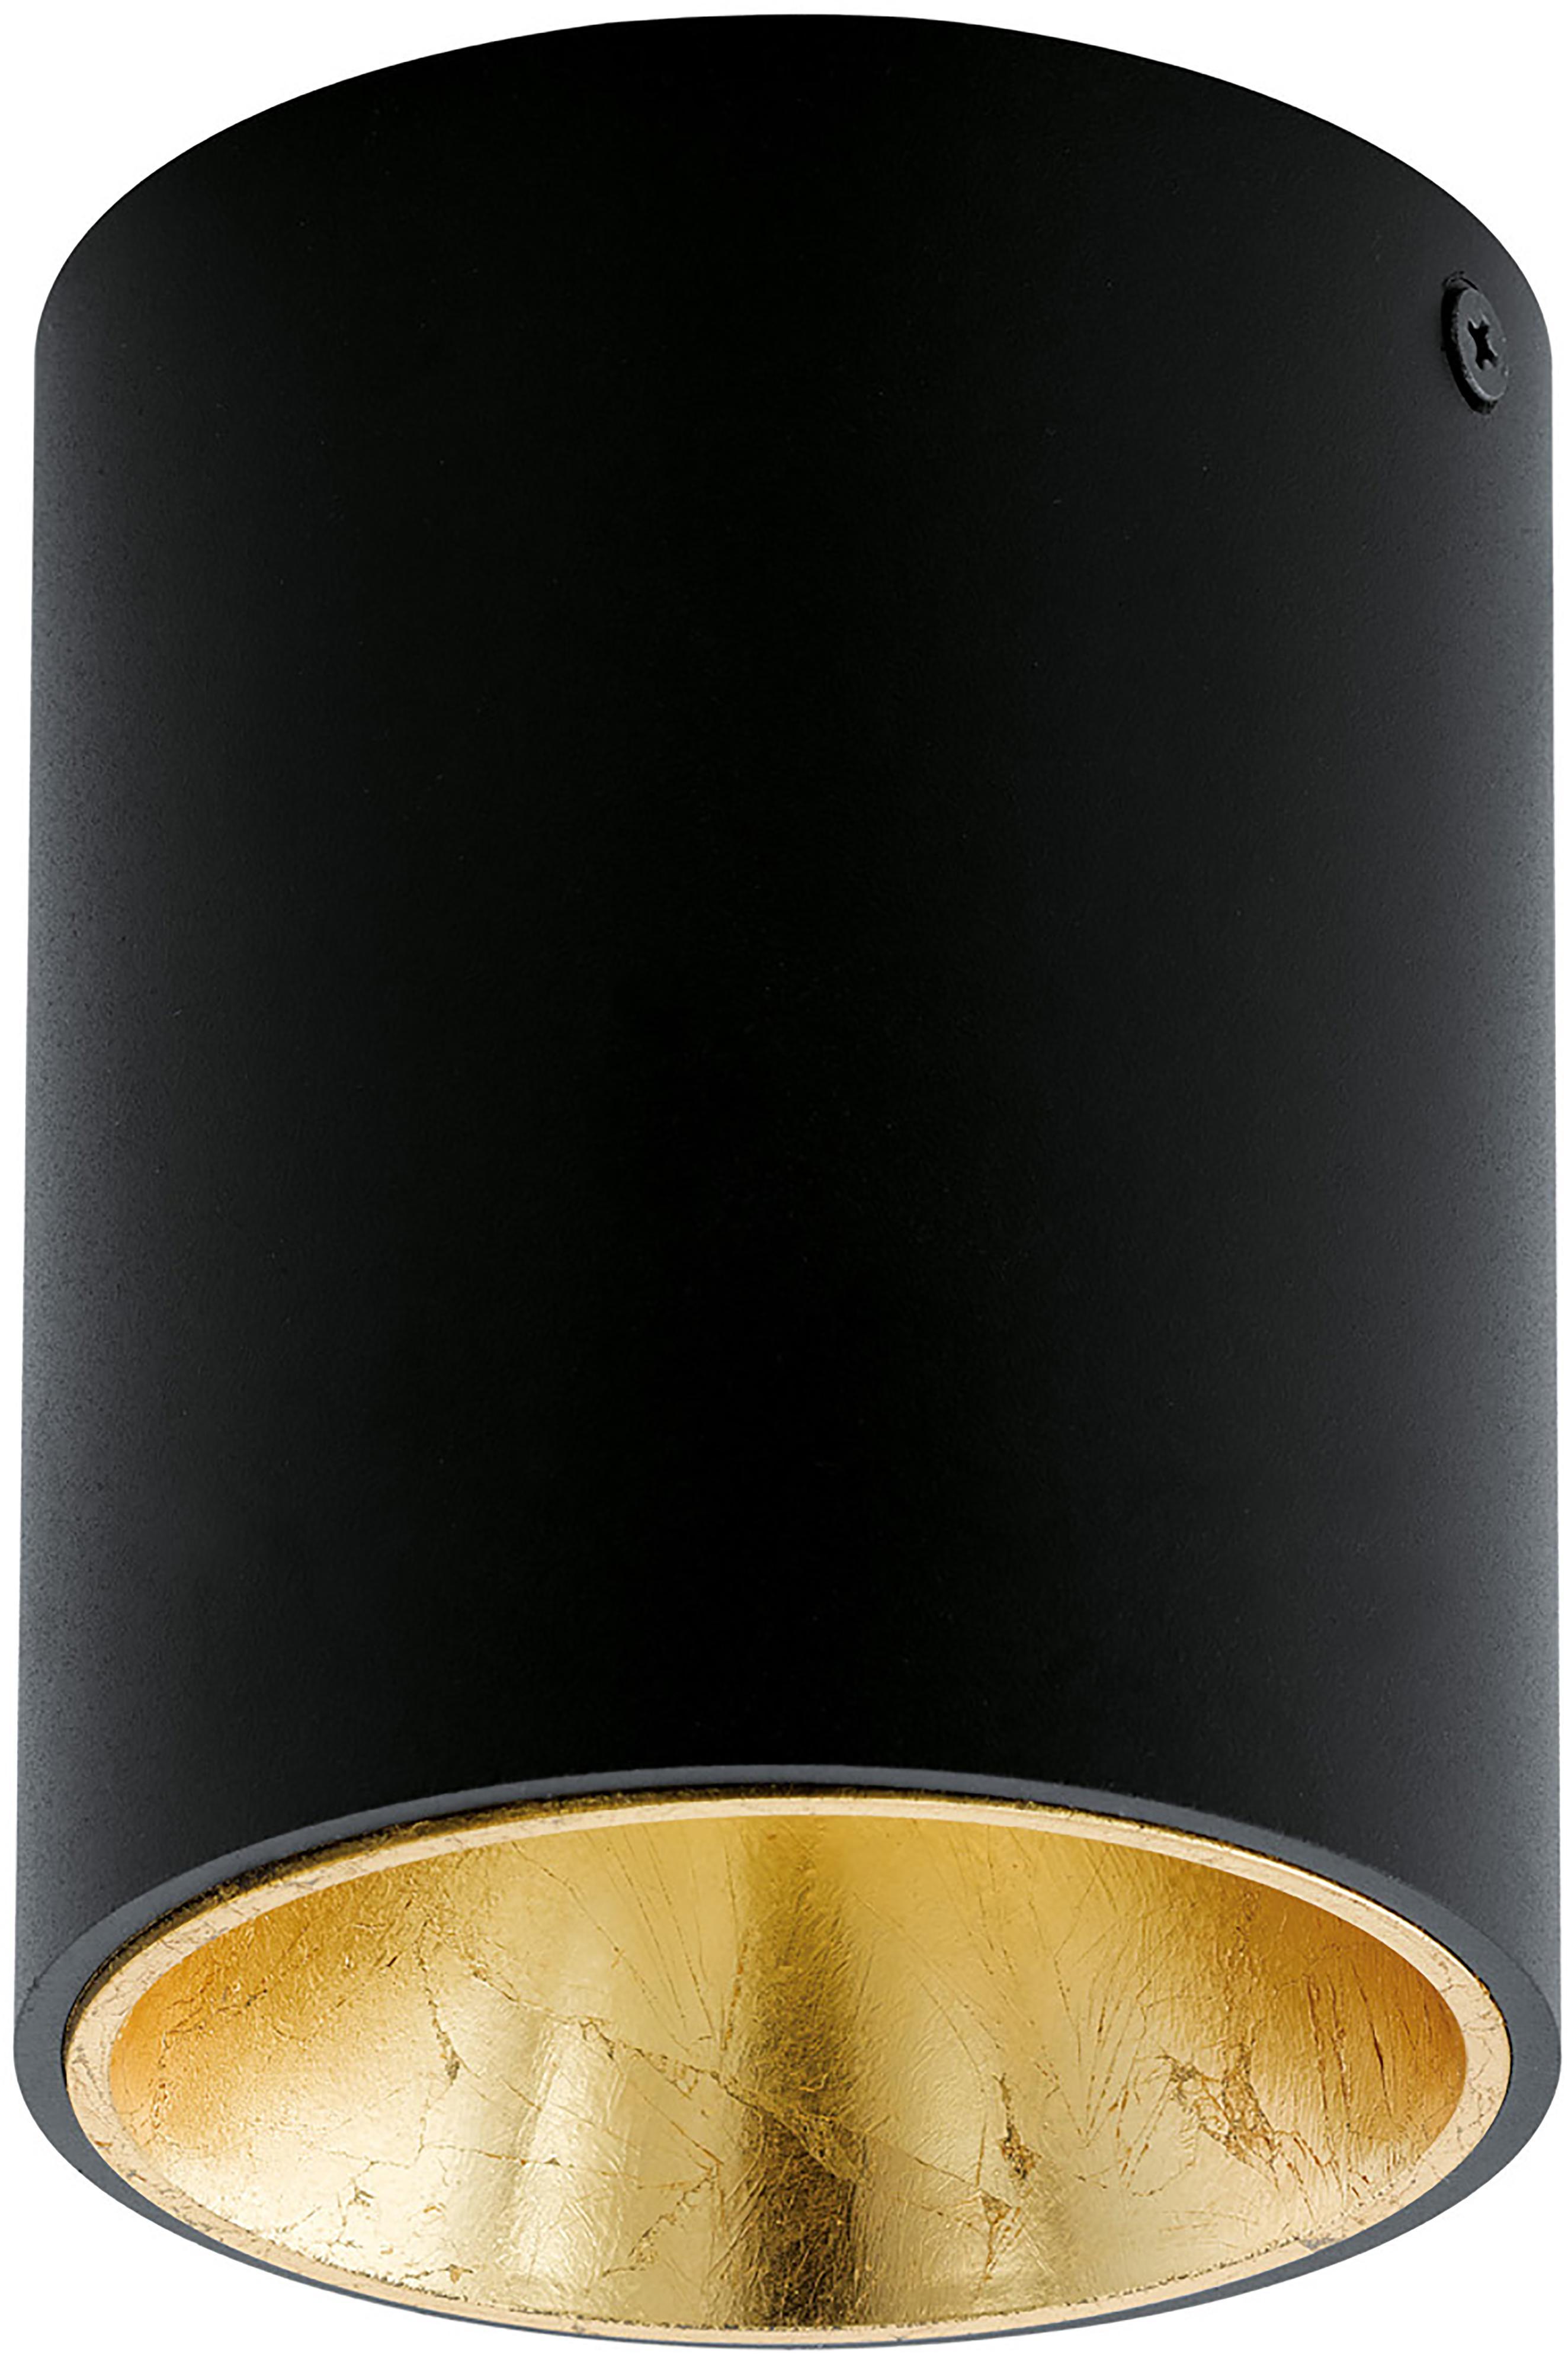 Plafondlamp Marty, Zwart, goudkleurig, Ø 10 x H 12 cm